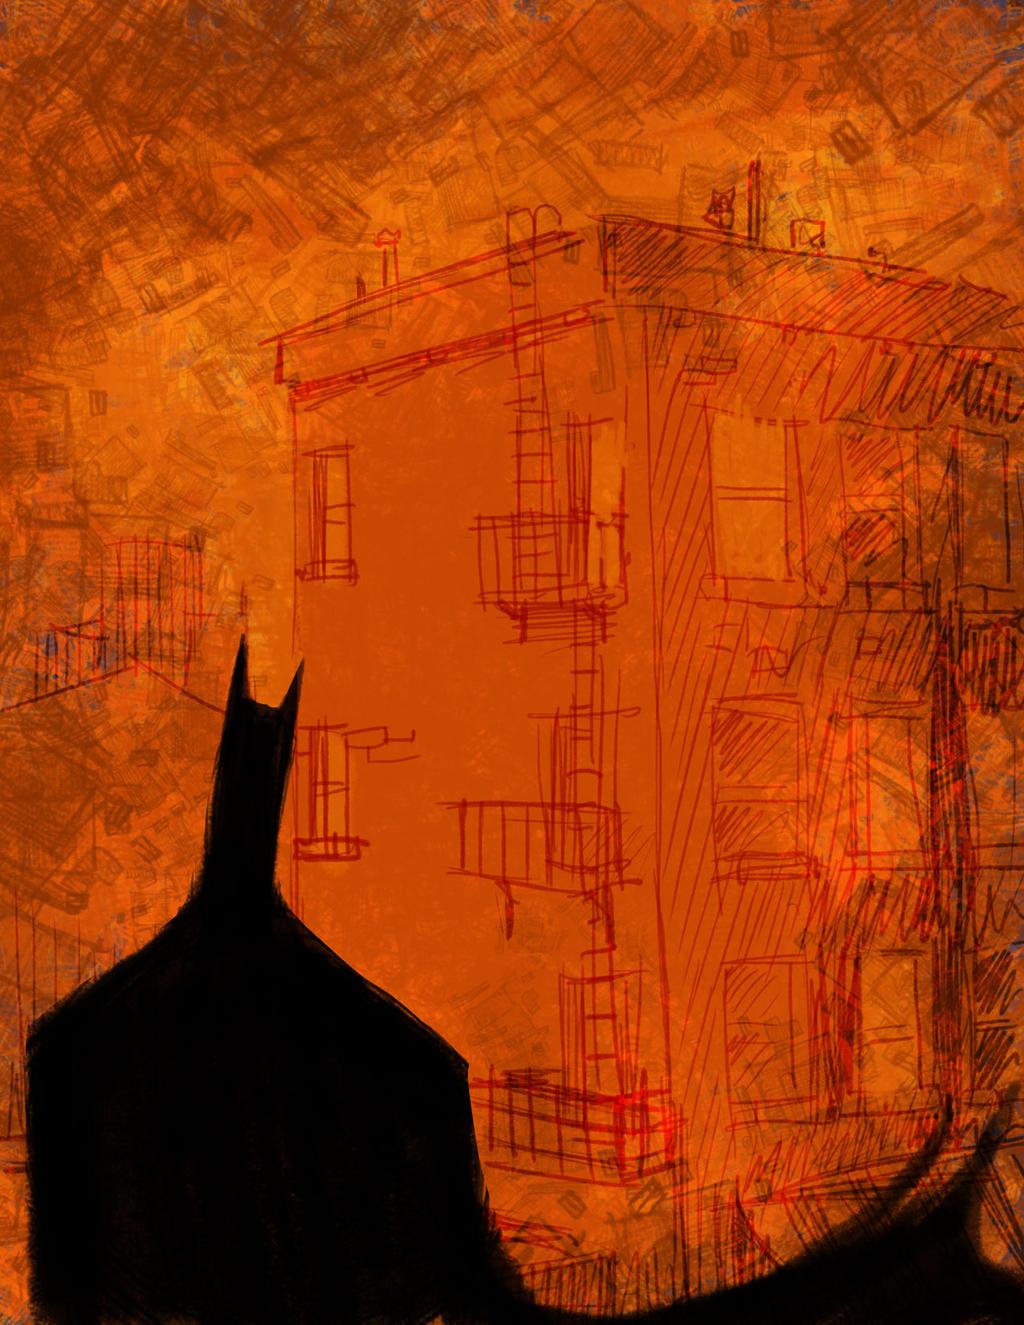 The bat doodle by atarashiidesu